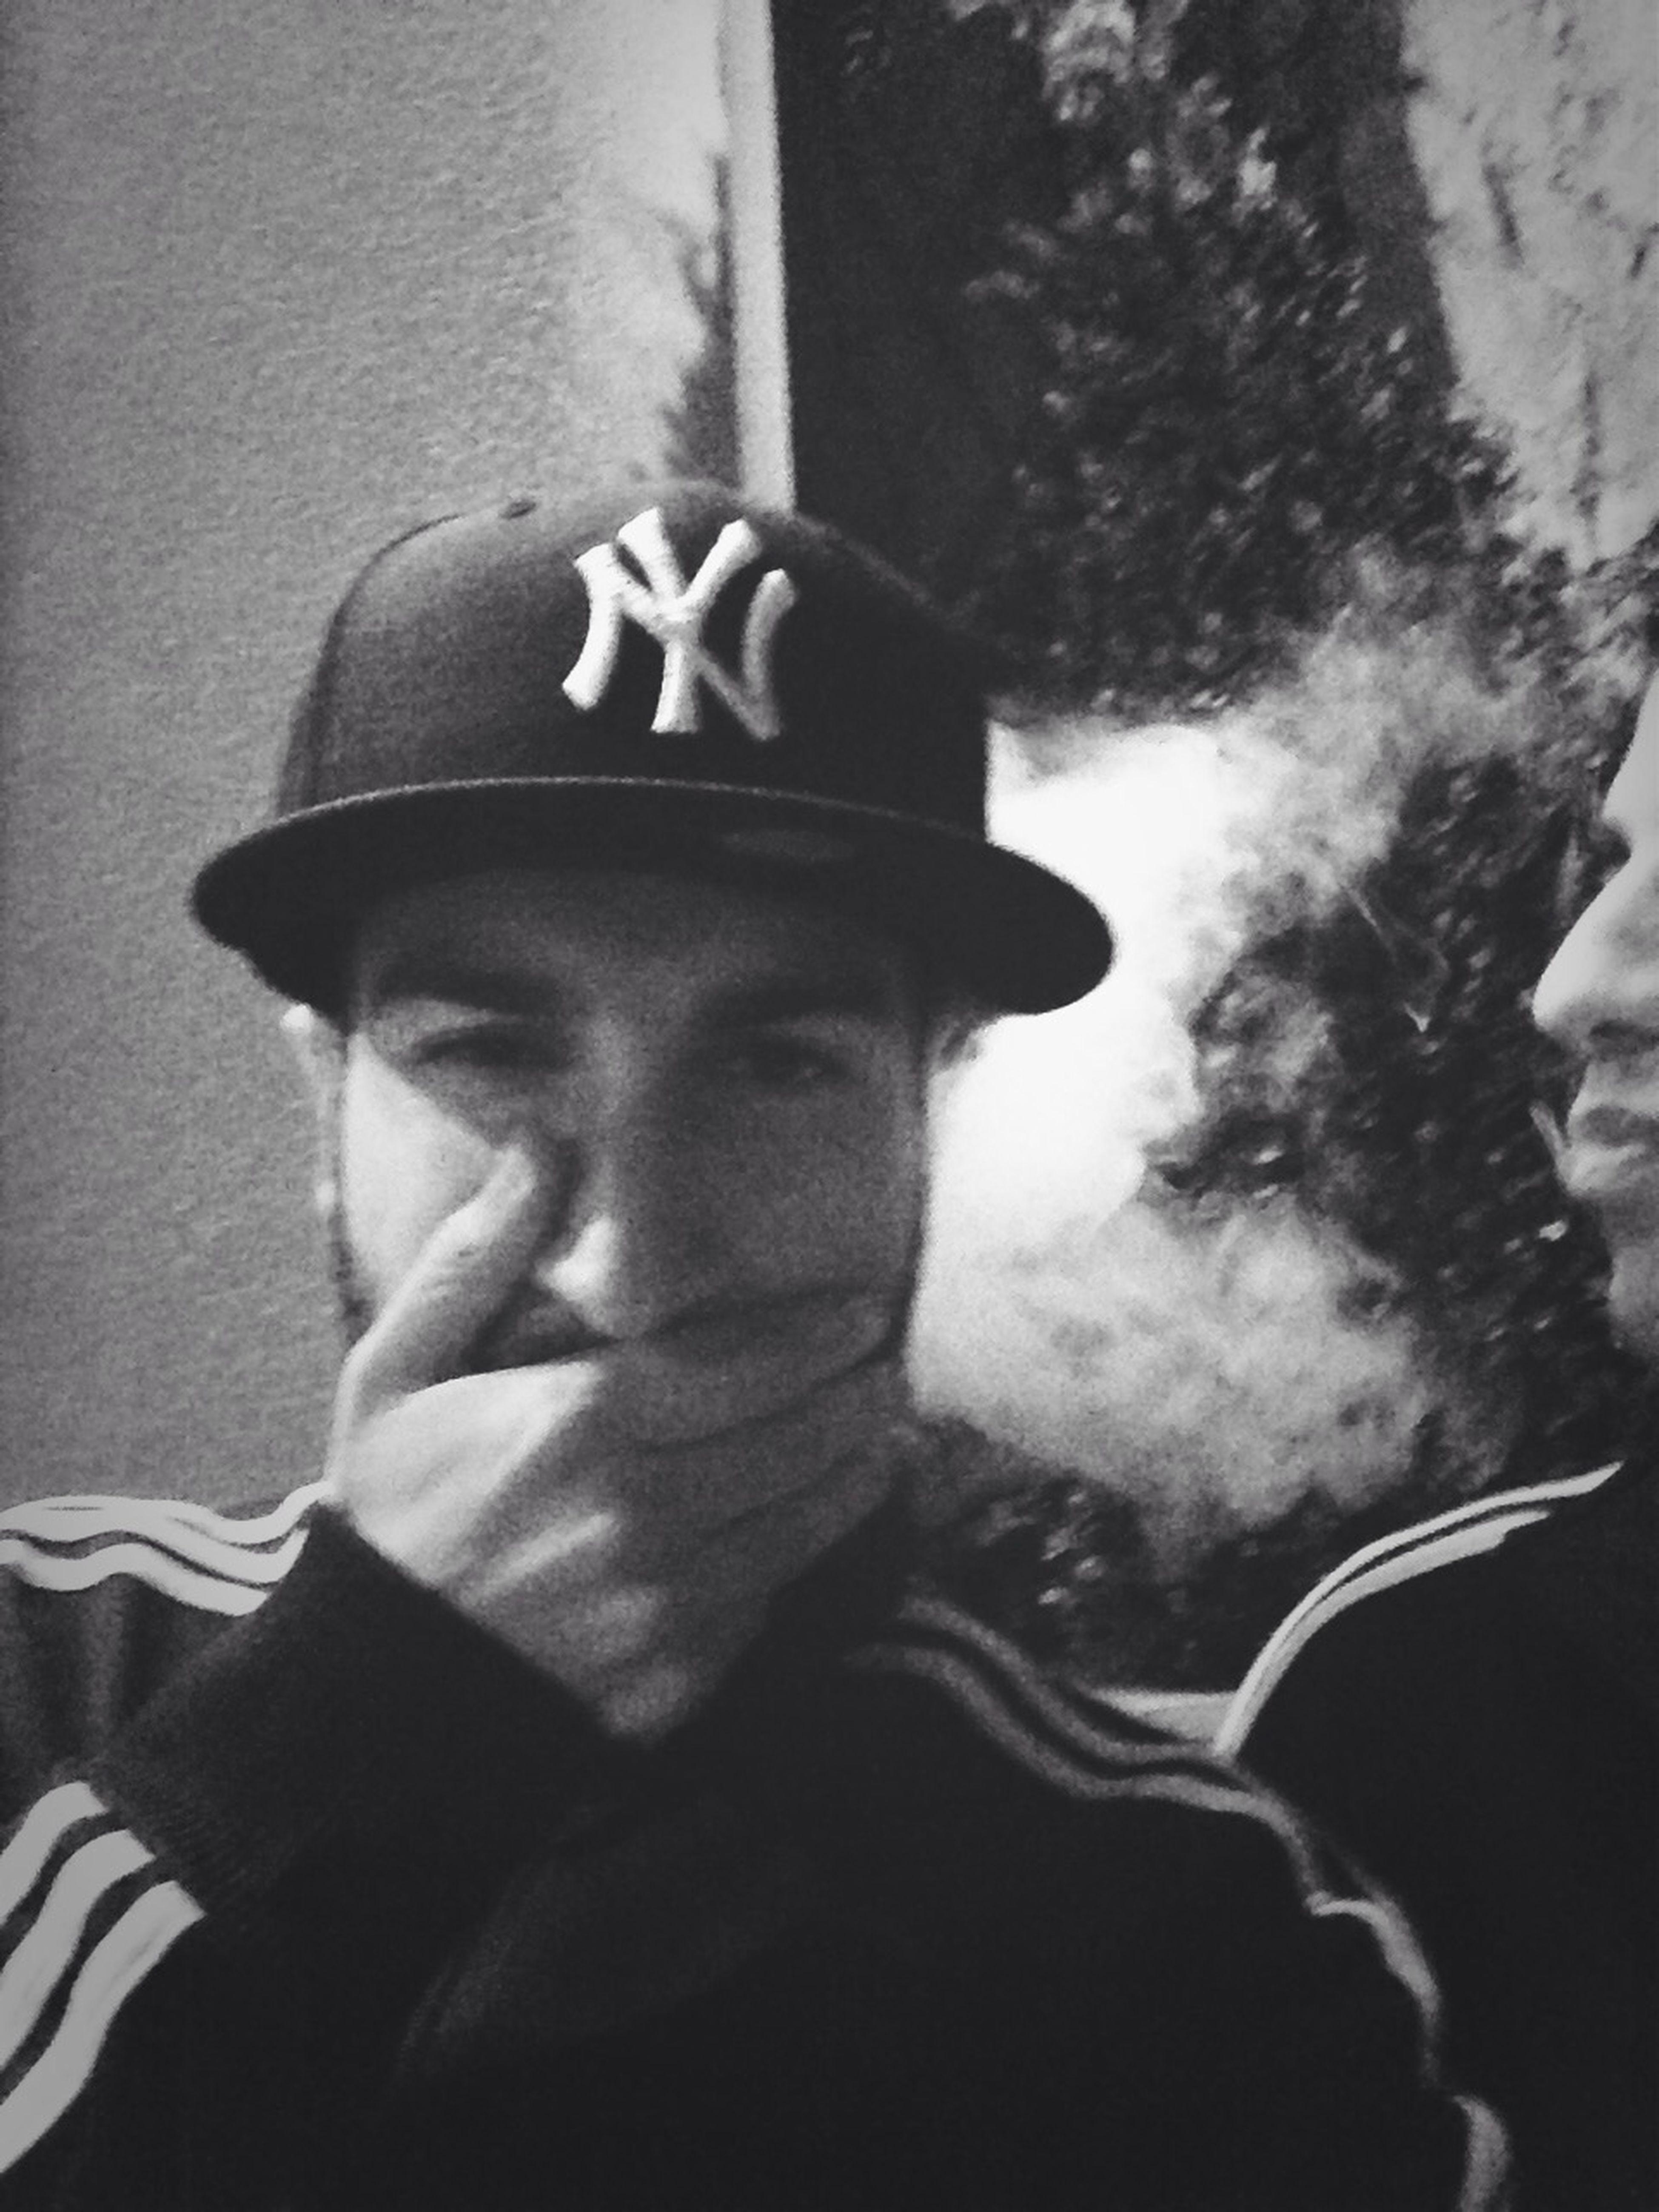 New York Thug Life DOPE Nice Atmosphere